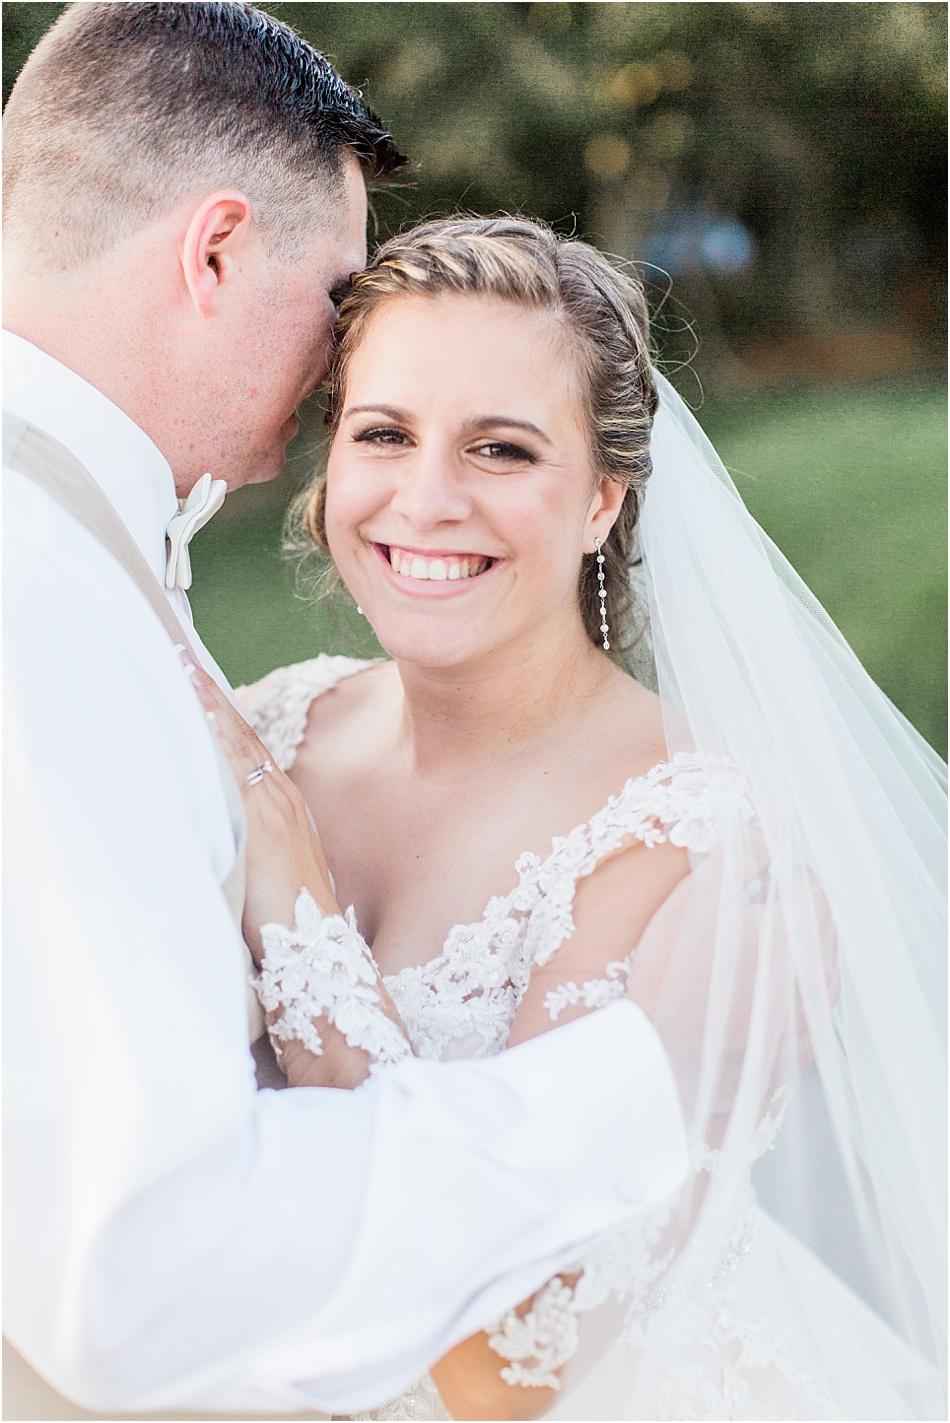 brookside_country_club_cape_cod_boston_wedding_photographer_Meredith_Jane_Photography_photo_0149.jpg